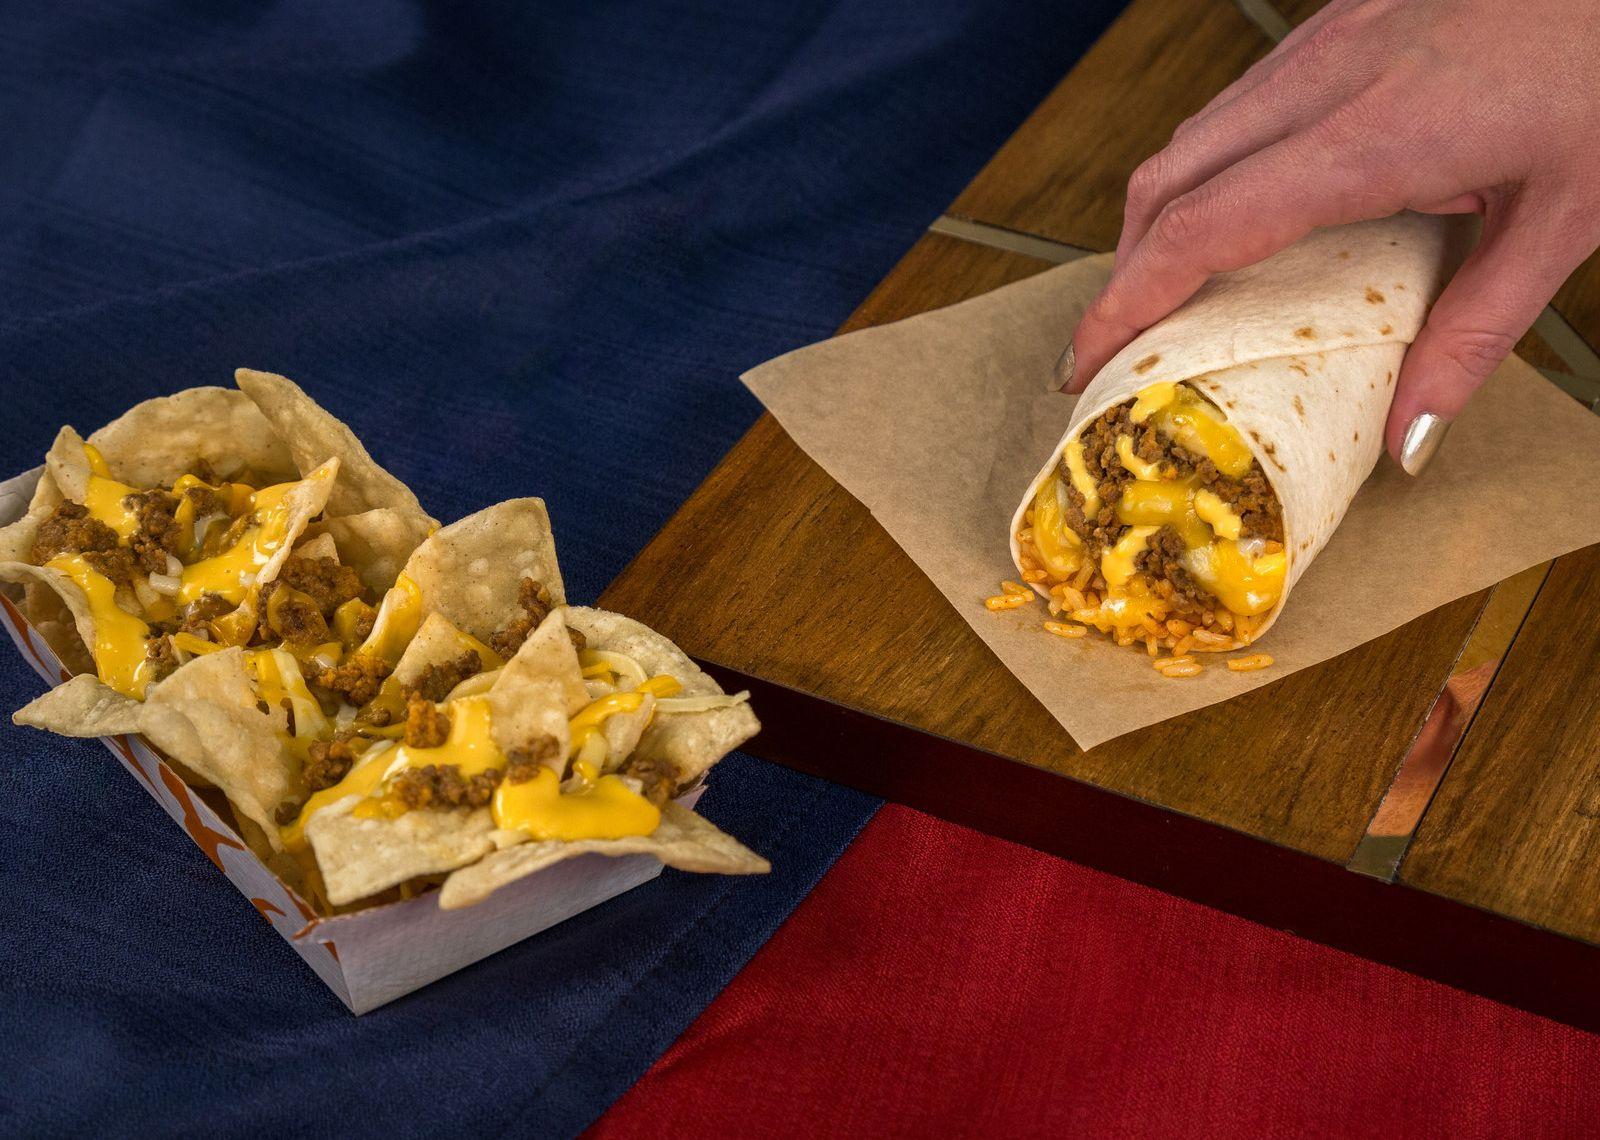 Taco Bell | RestaurantNewsRelease.com